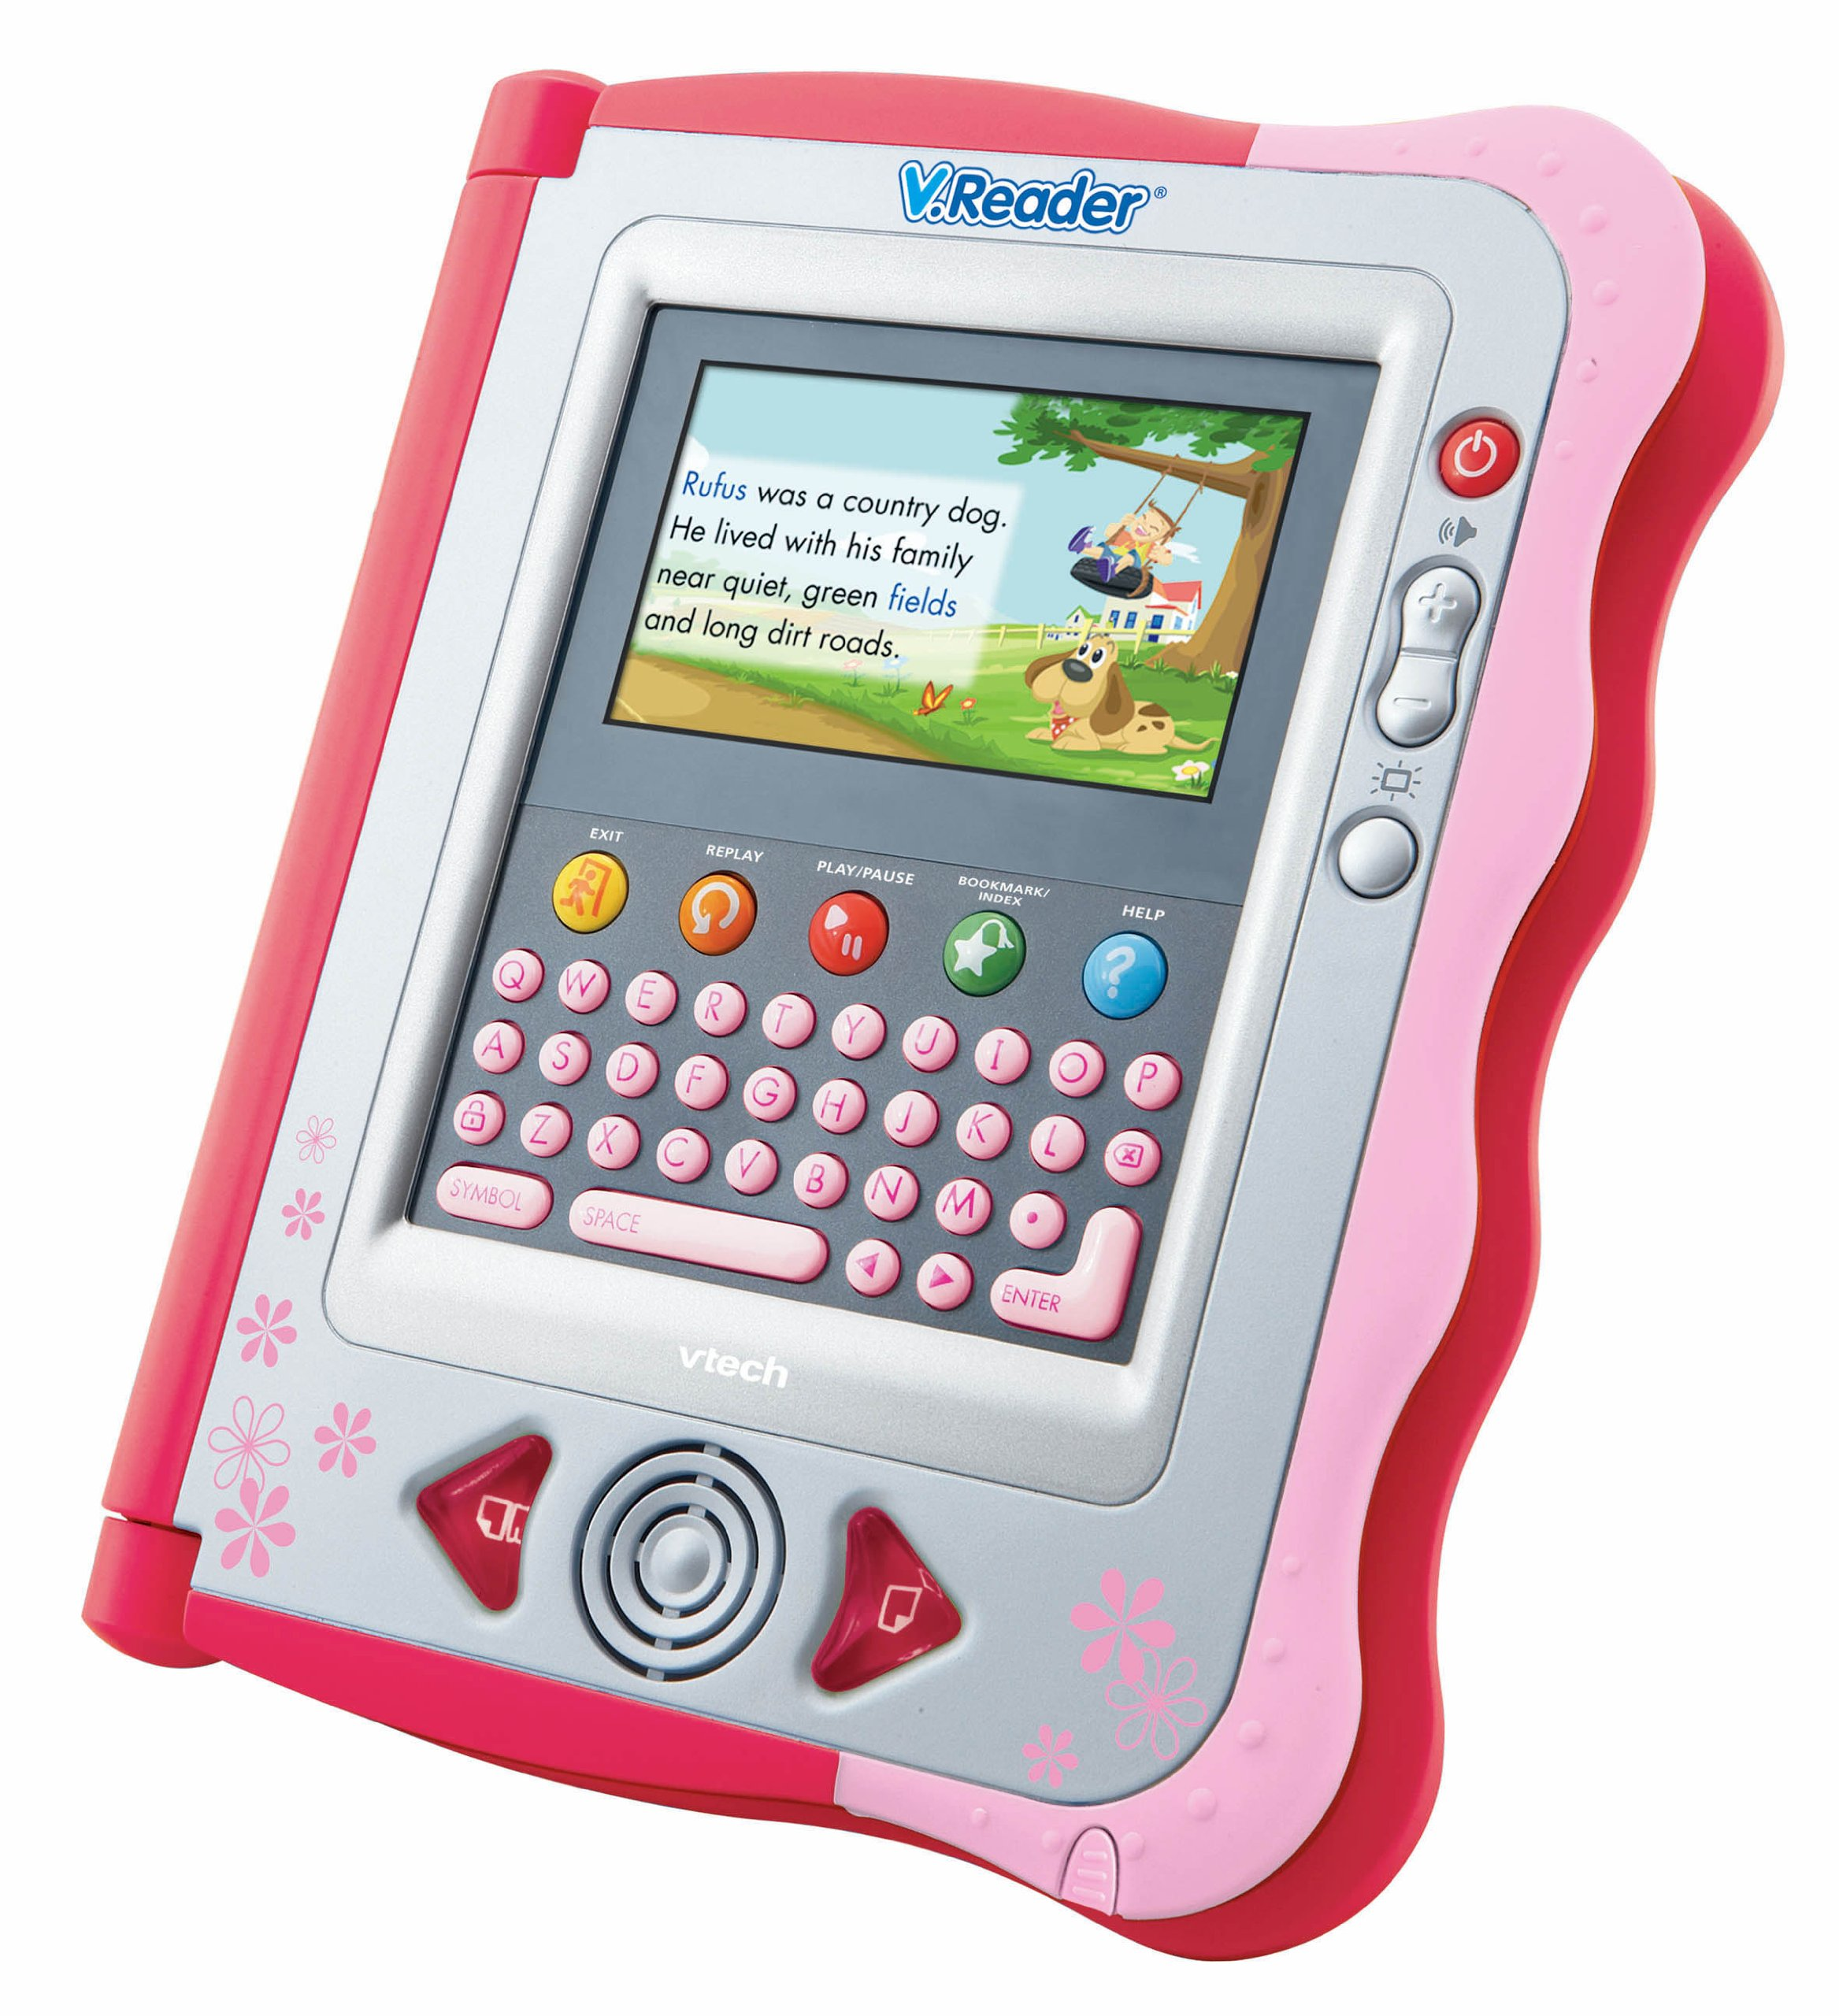 V.Reader Animated E-Book System - Pink by VTech (Image #2)